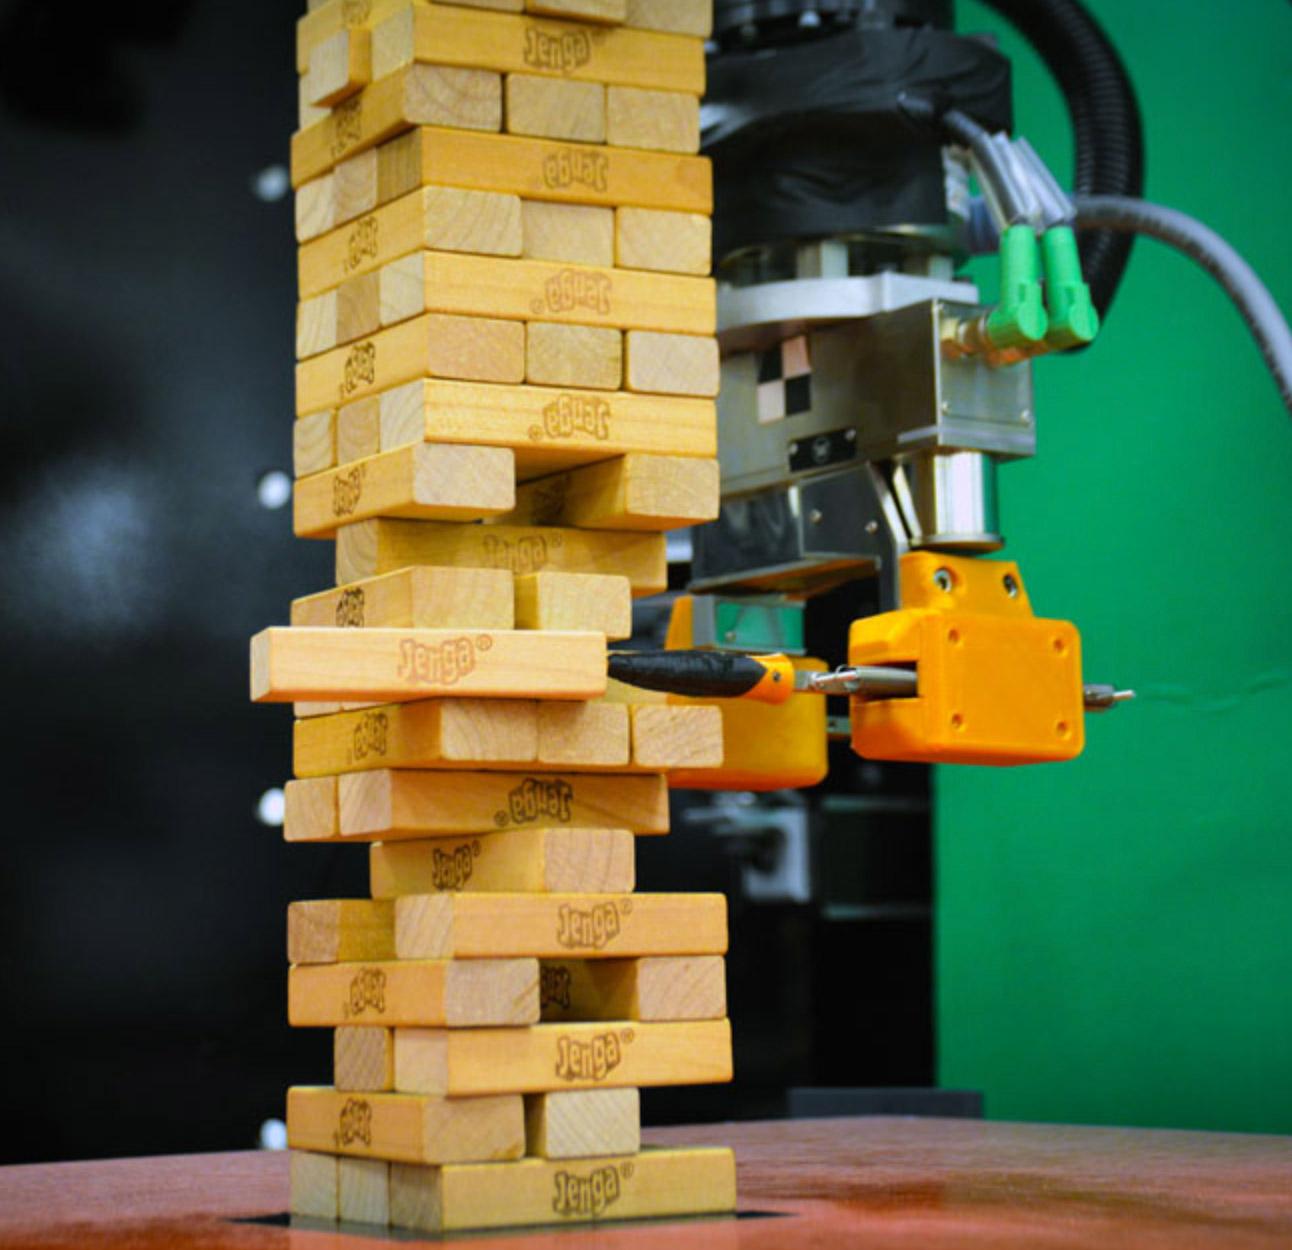 MIT Robot Jenga